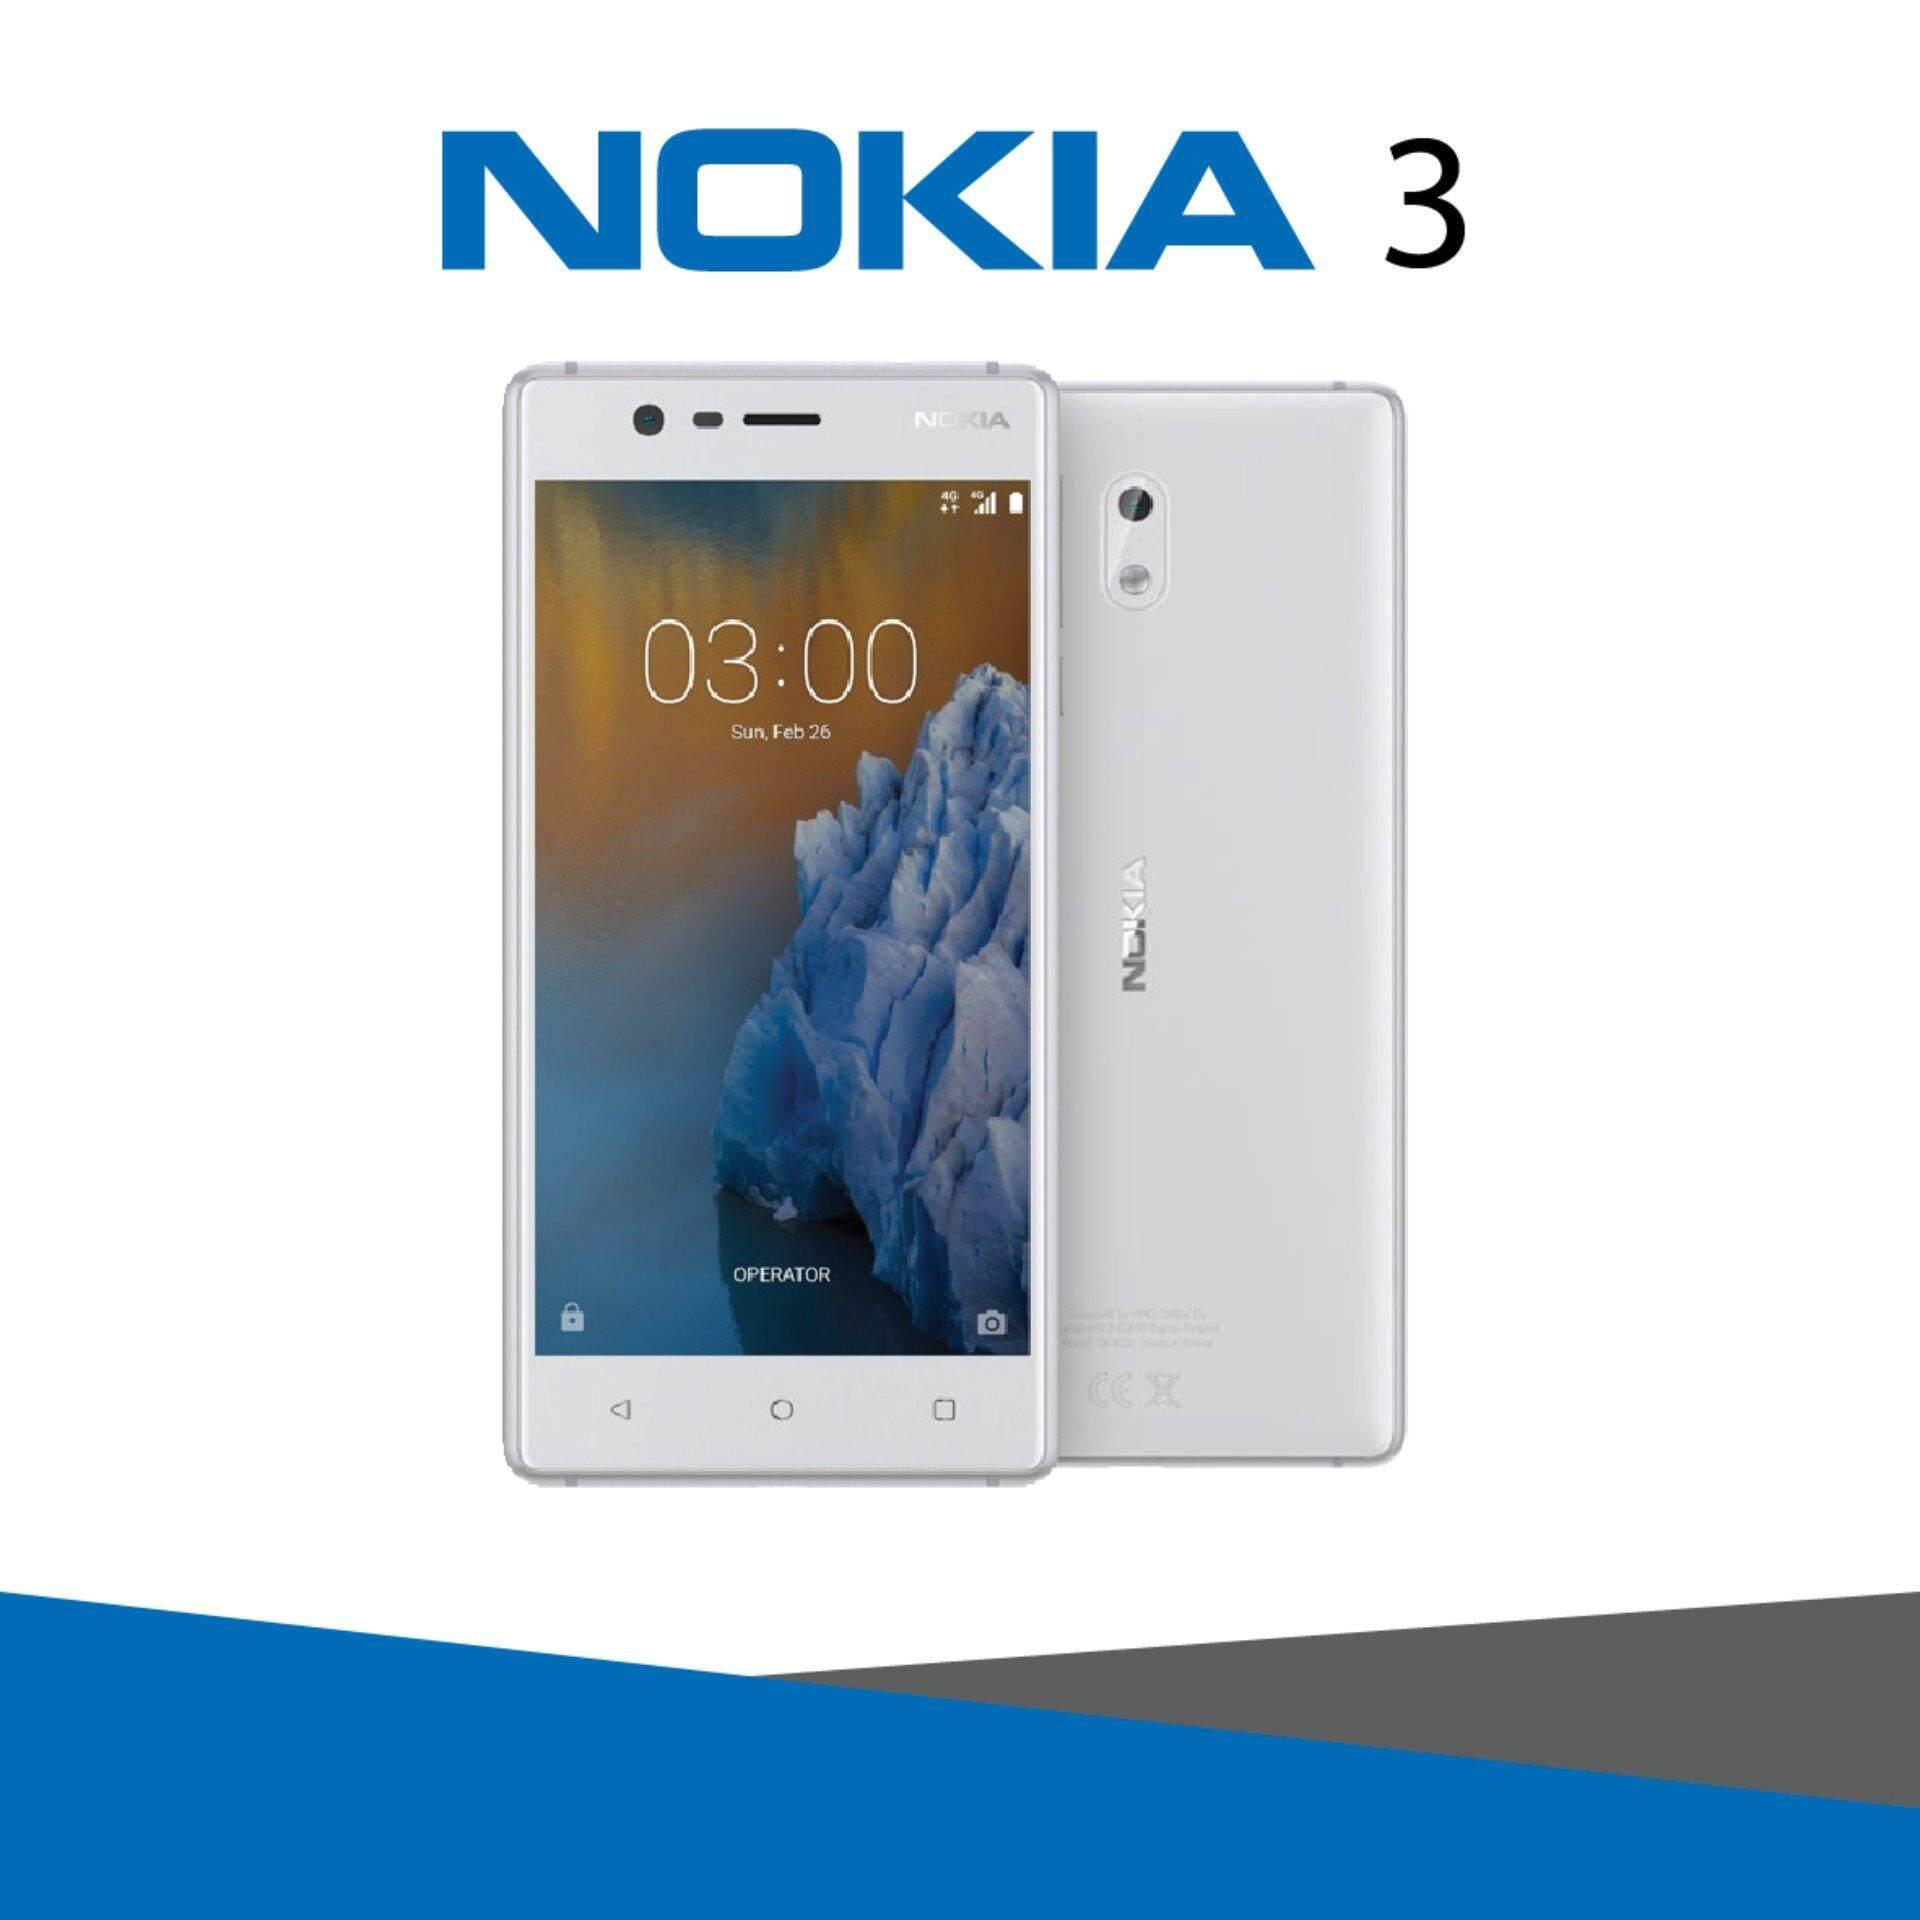 Nokia 3 Ram 2 GB / Rom 16 GB